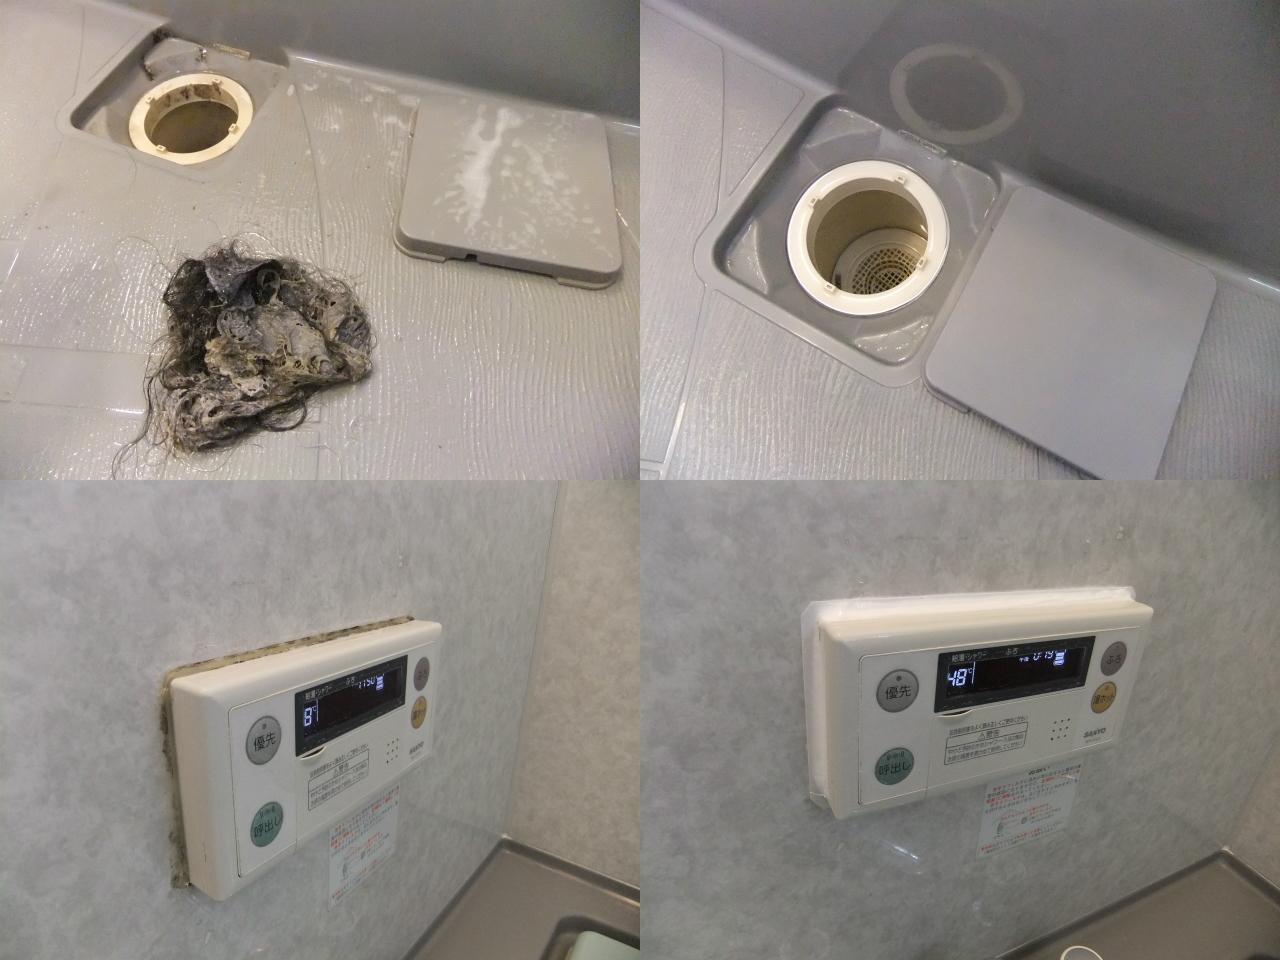 http://ajras.net/images/120606-bathroom2.jpg